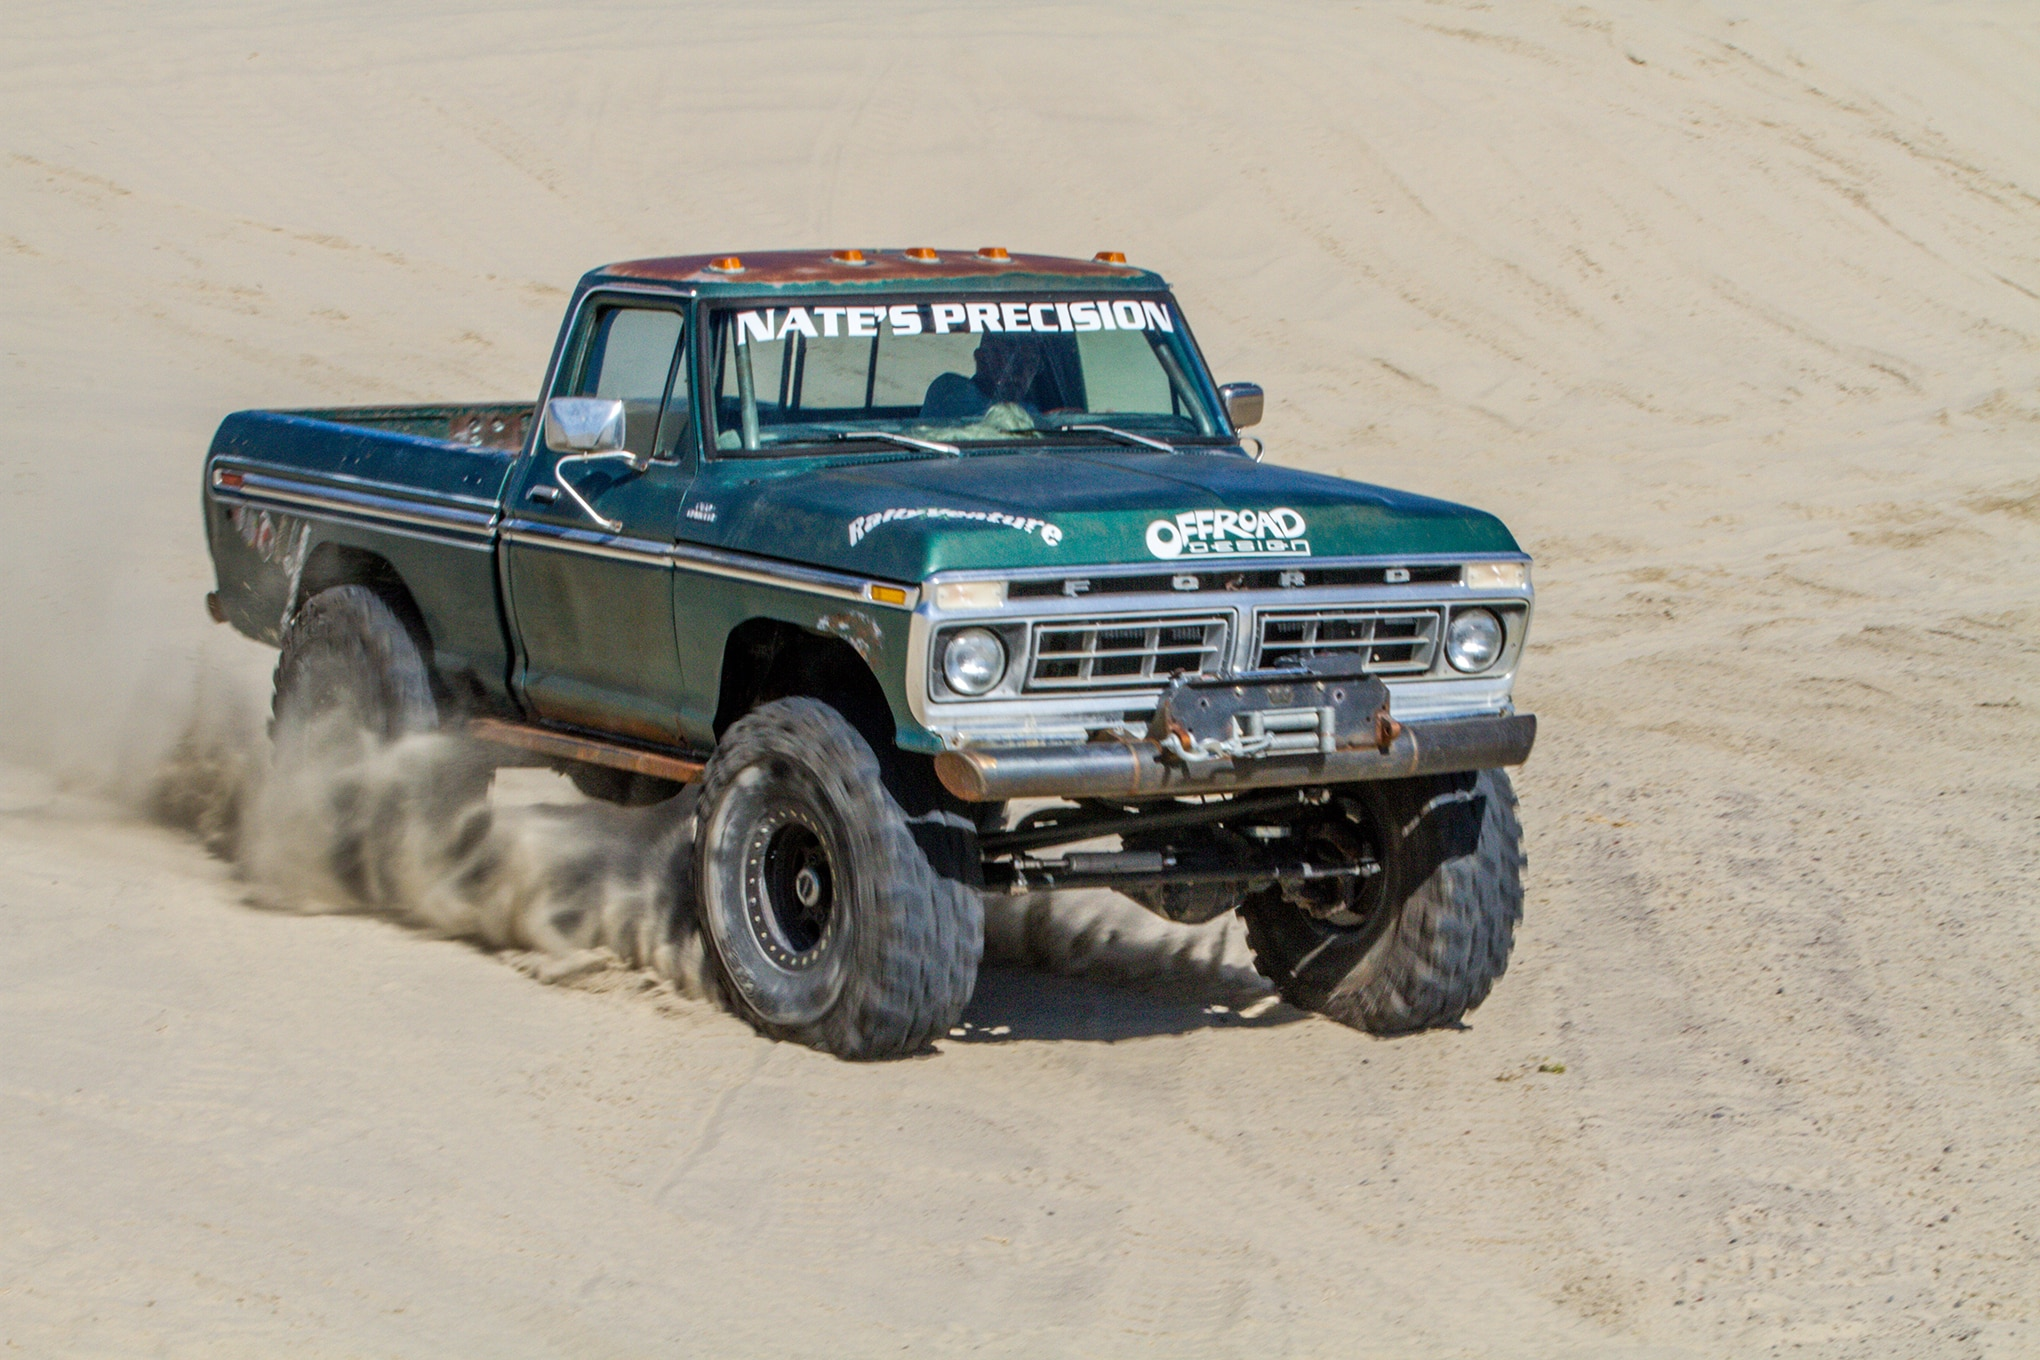 007 pit bull pbx tire sand dunes